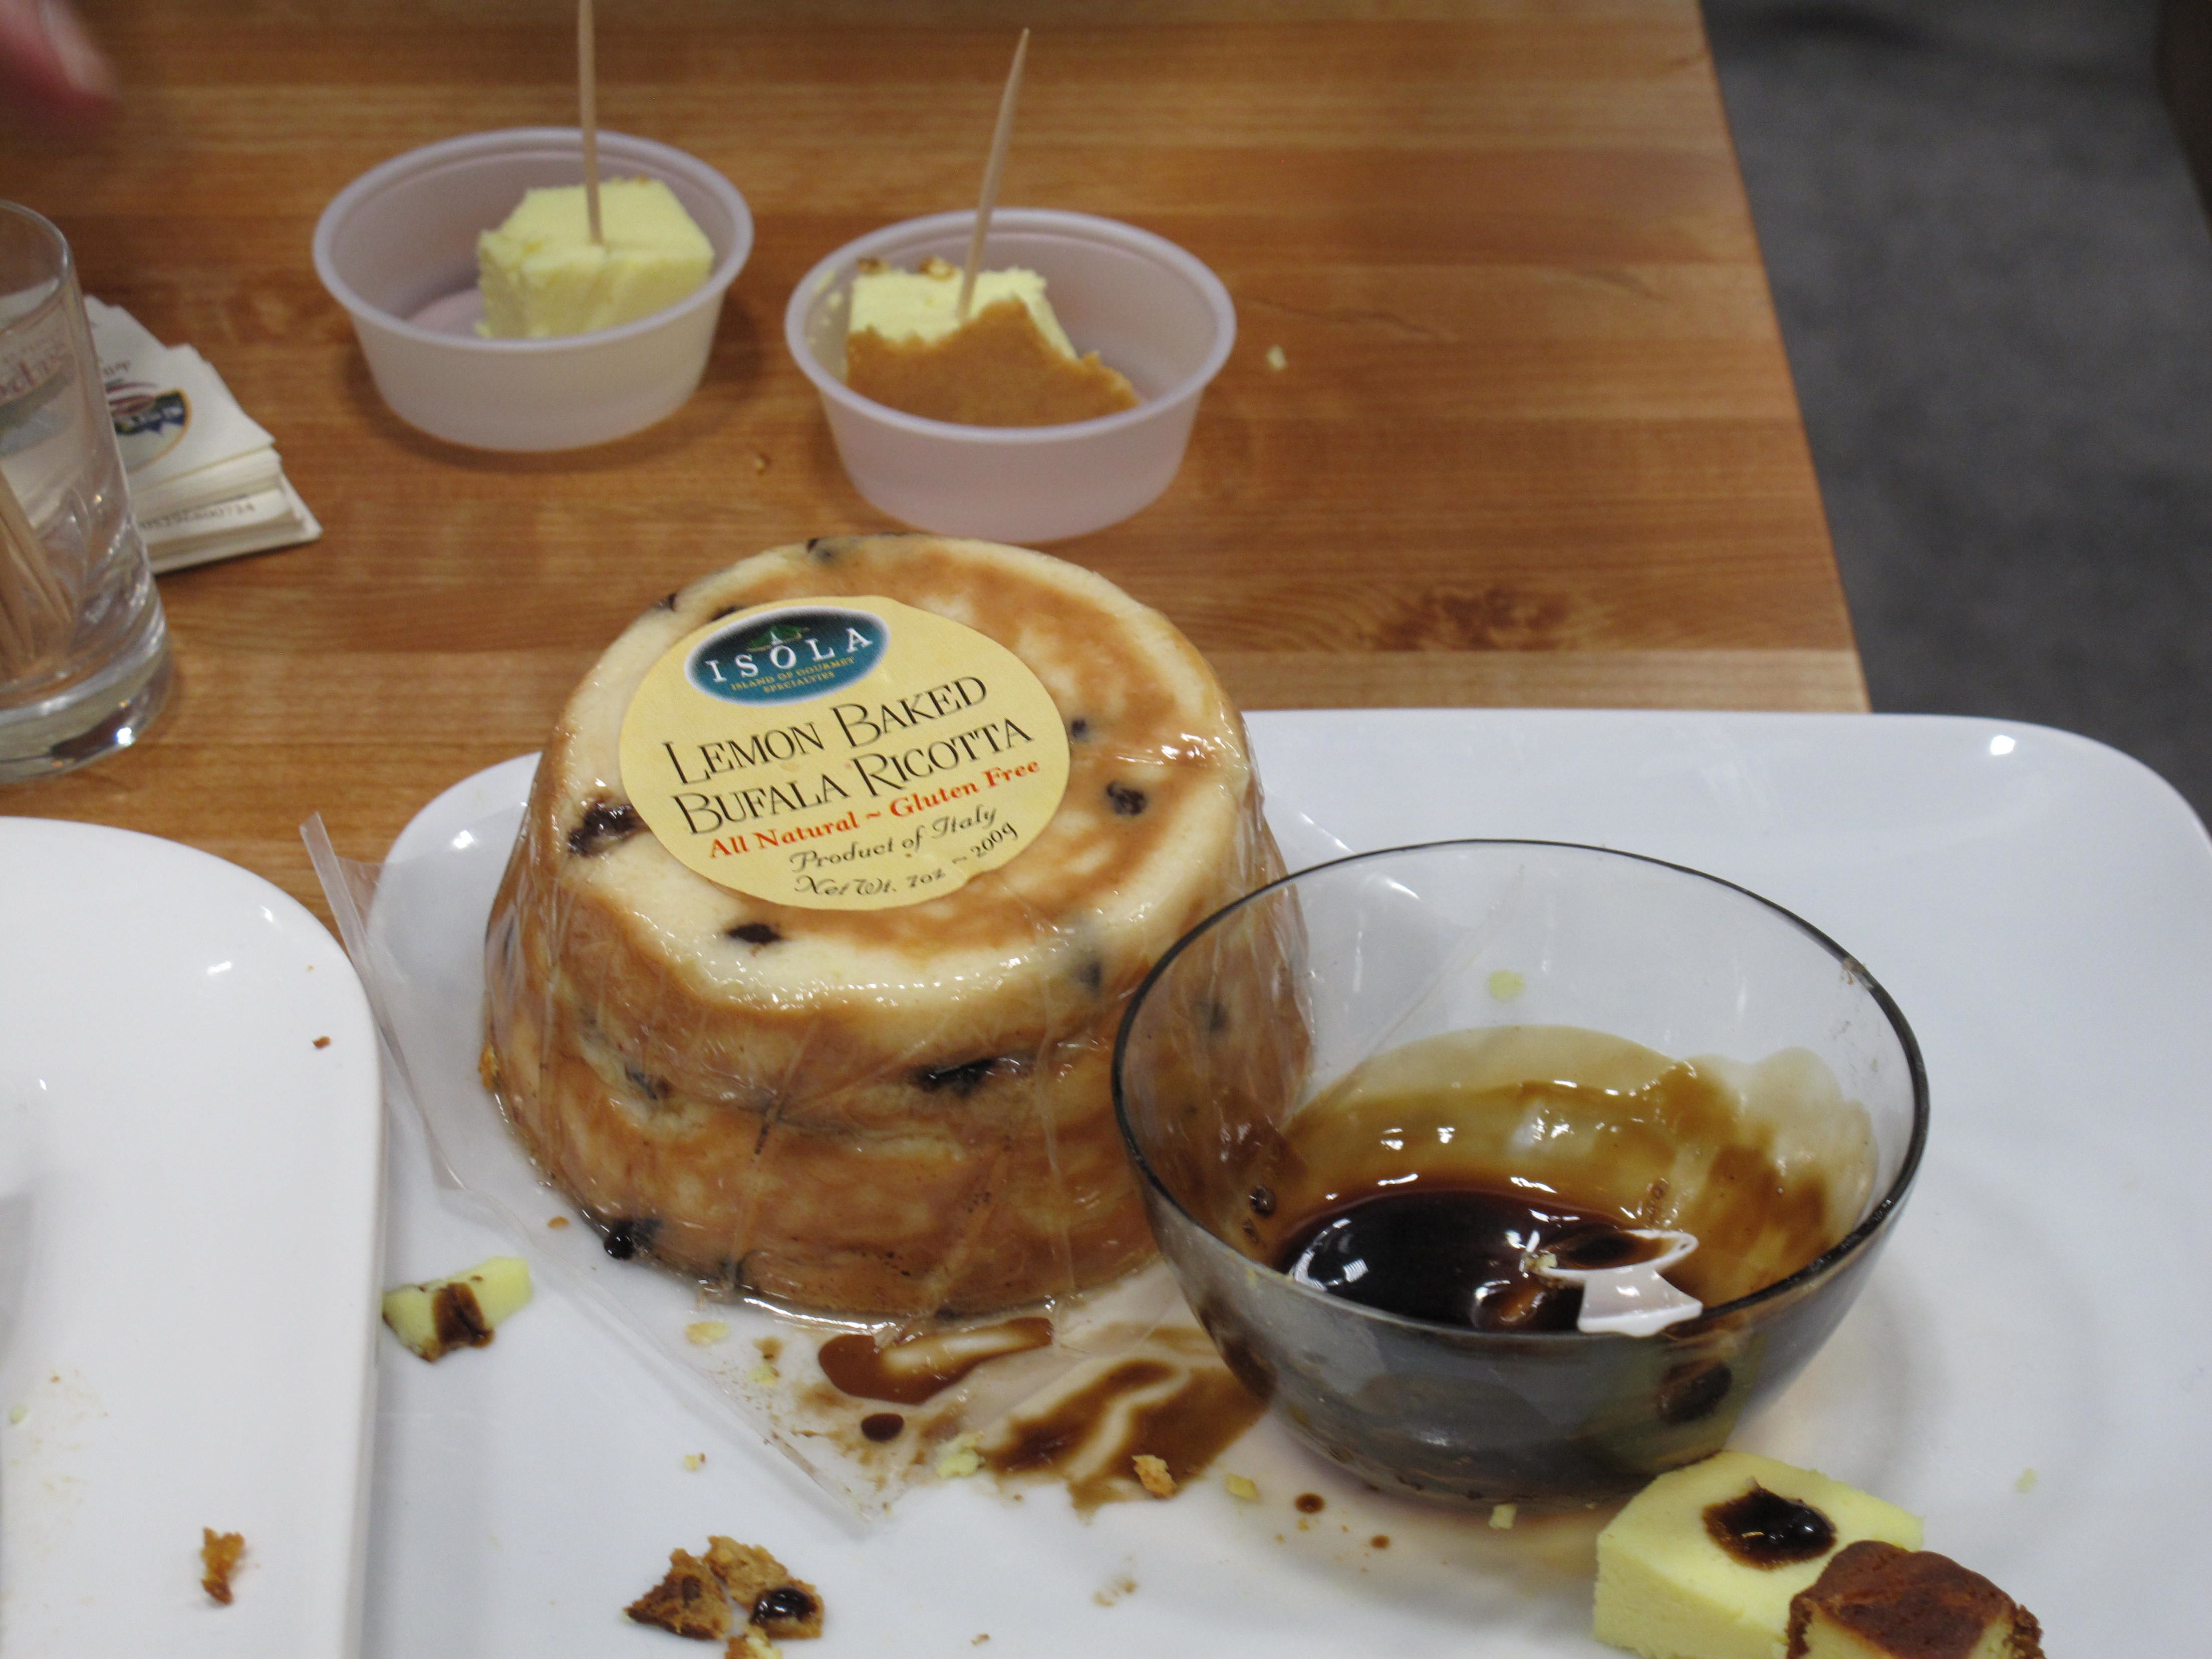 Lemon Cheesecake-Flavored Cheese